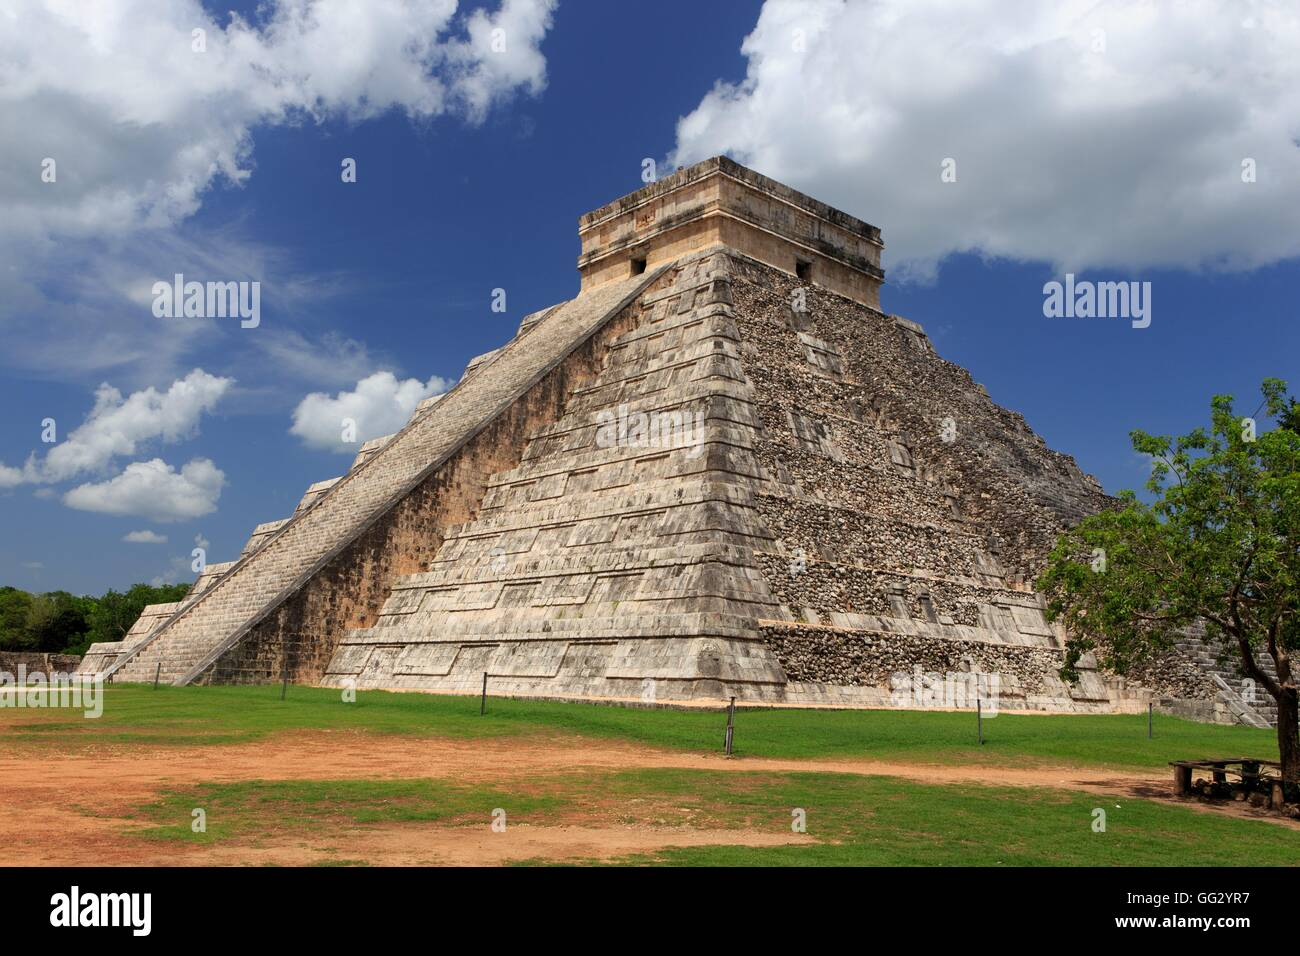 The historic Mayan site of Chichen Itza on the Yucatan Peninsula of Mexico, Central America. - Stock Image